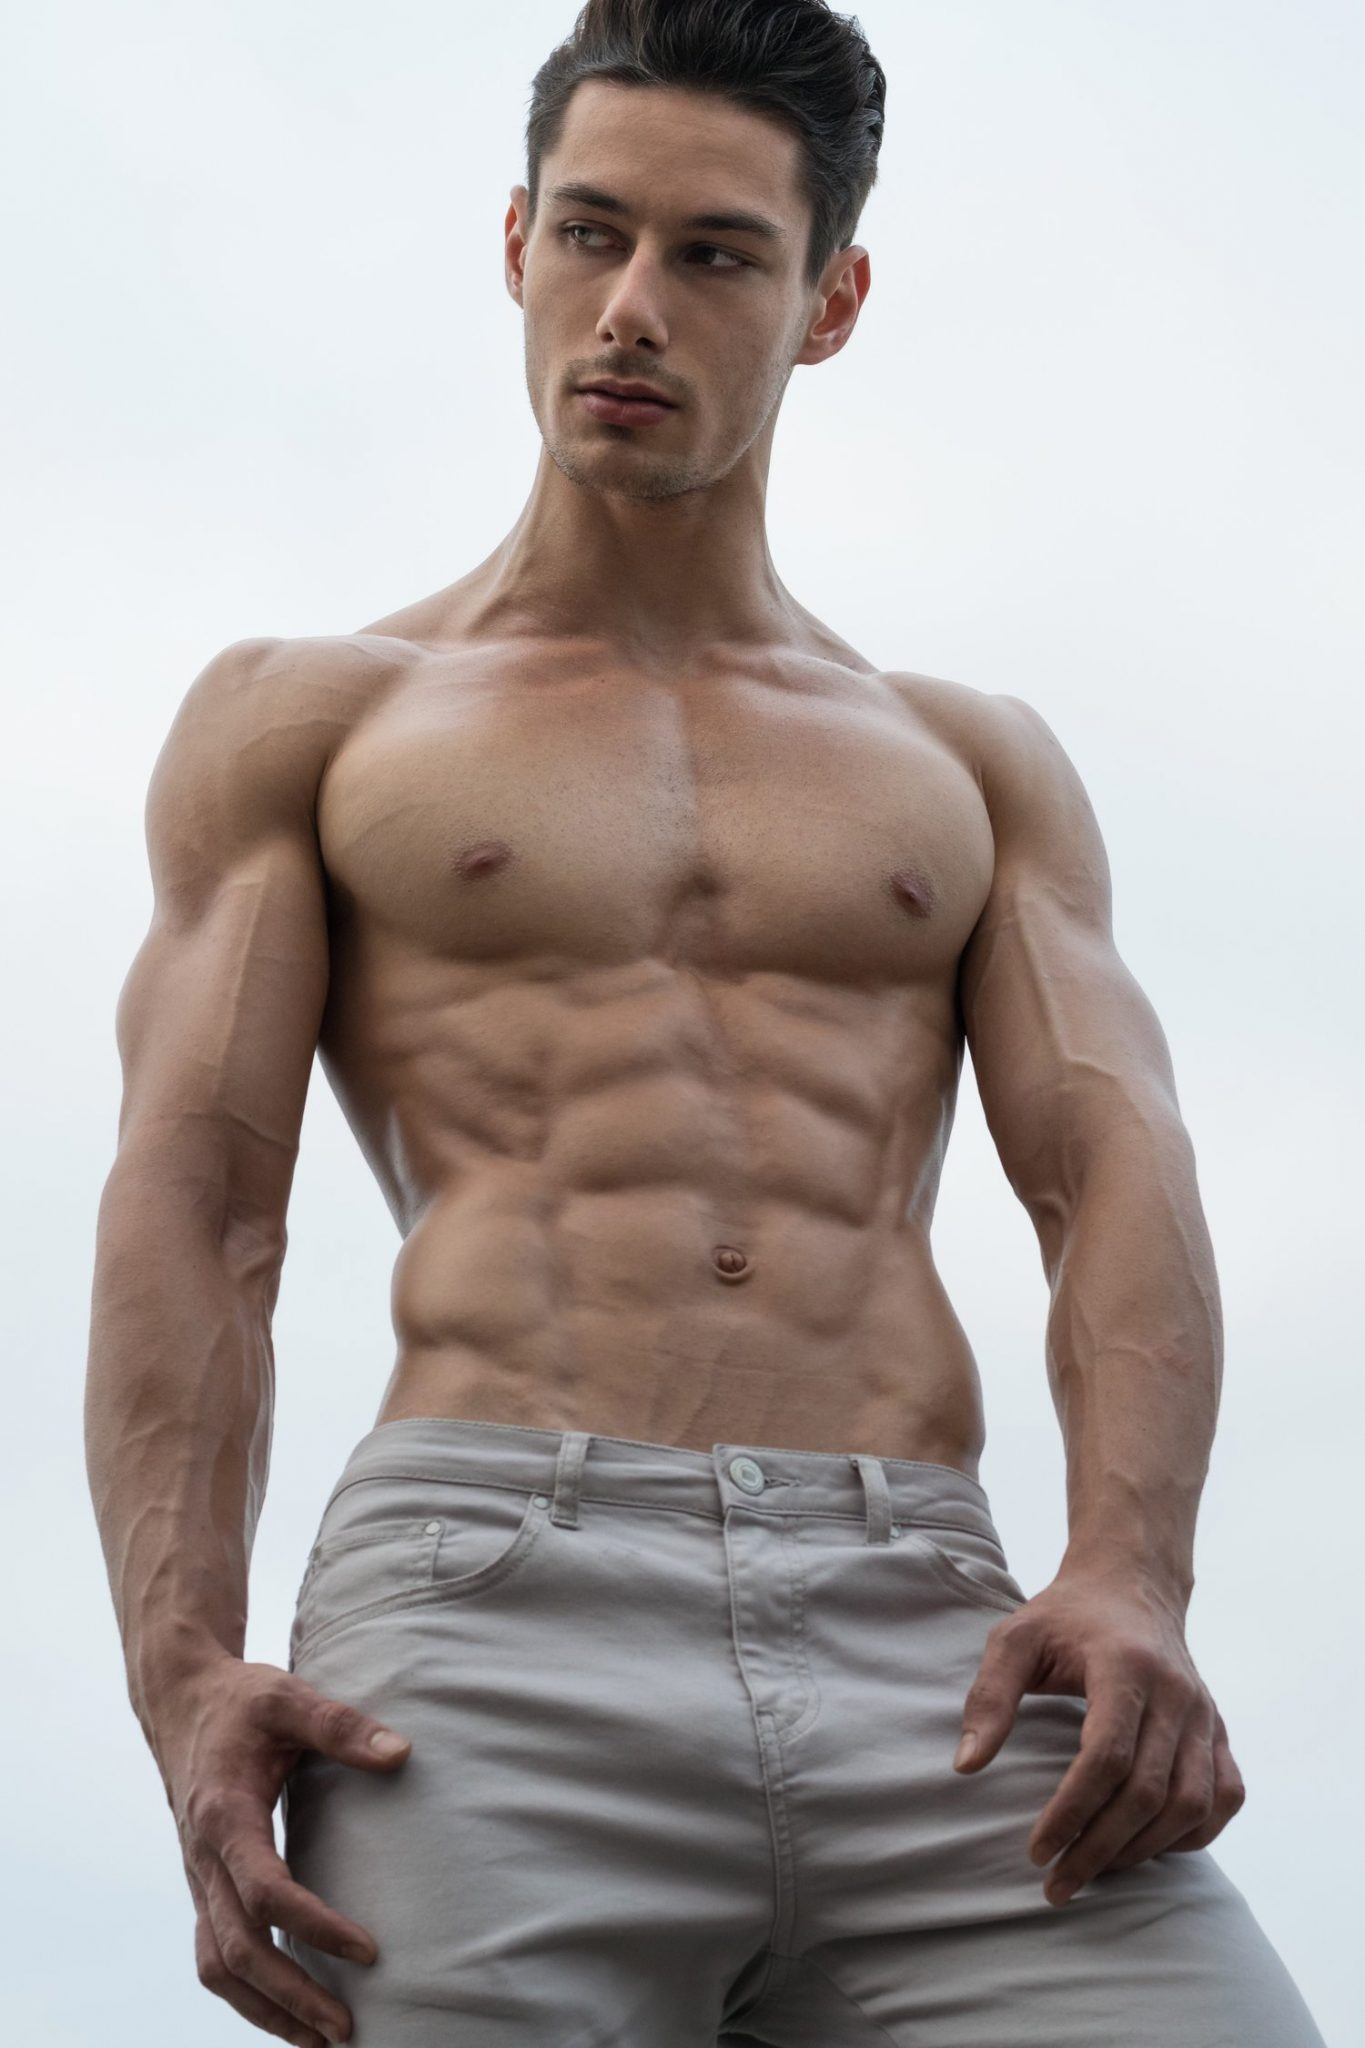 Brazilian Male Model Everton Stedile By Corey Watson Turner